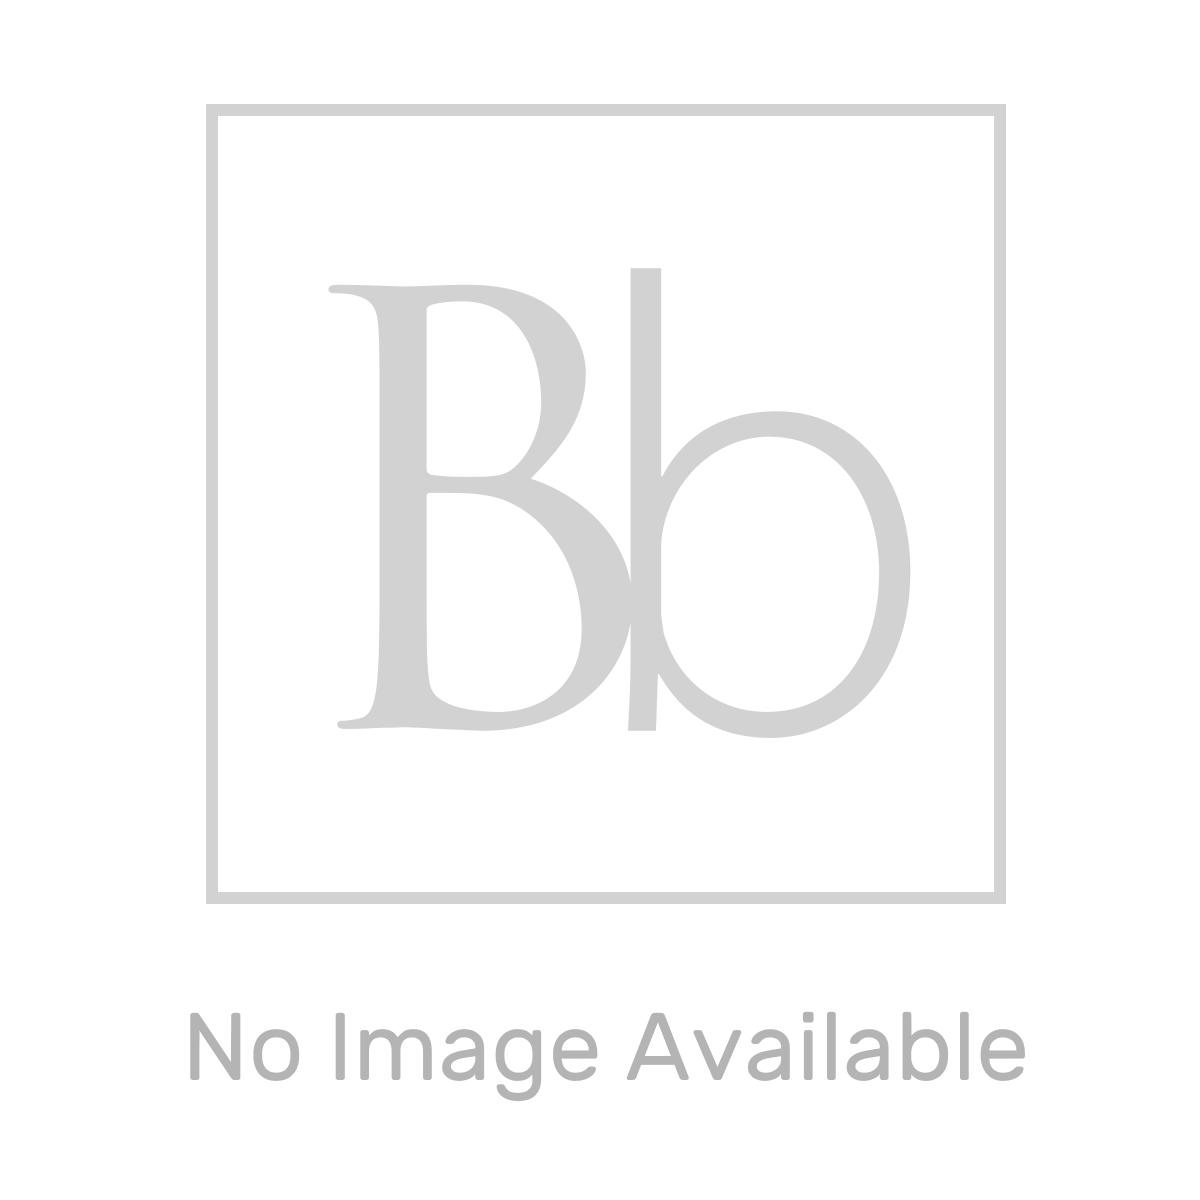 Elation Ikoma Pearl Grey Matt Mirror Unit 750mm Dimensions